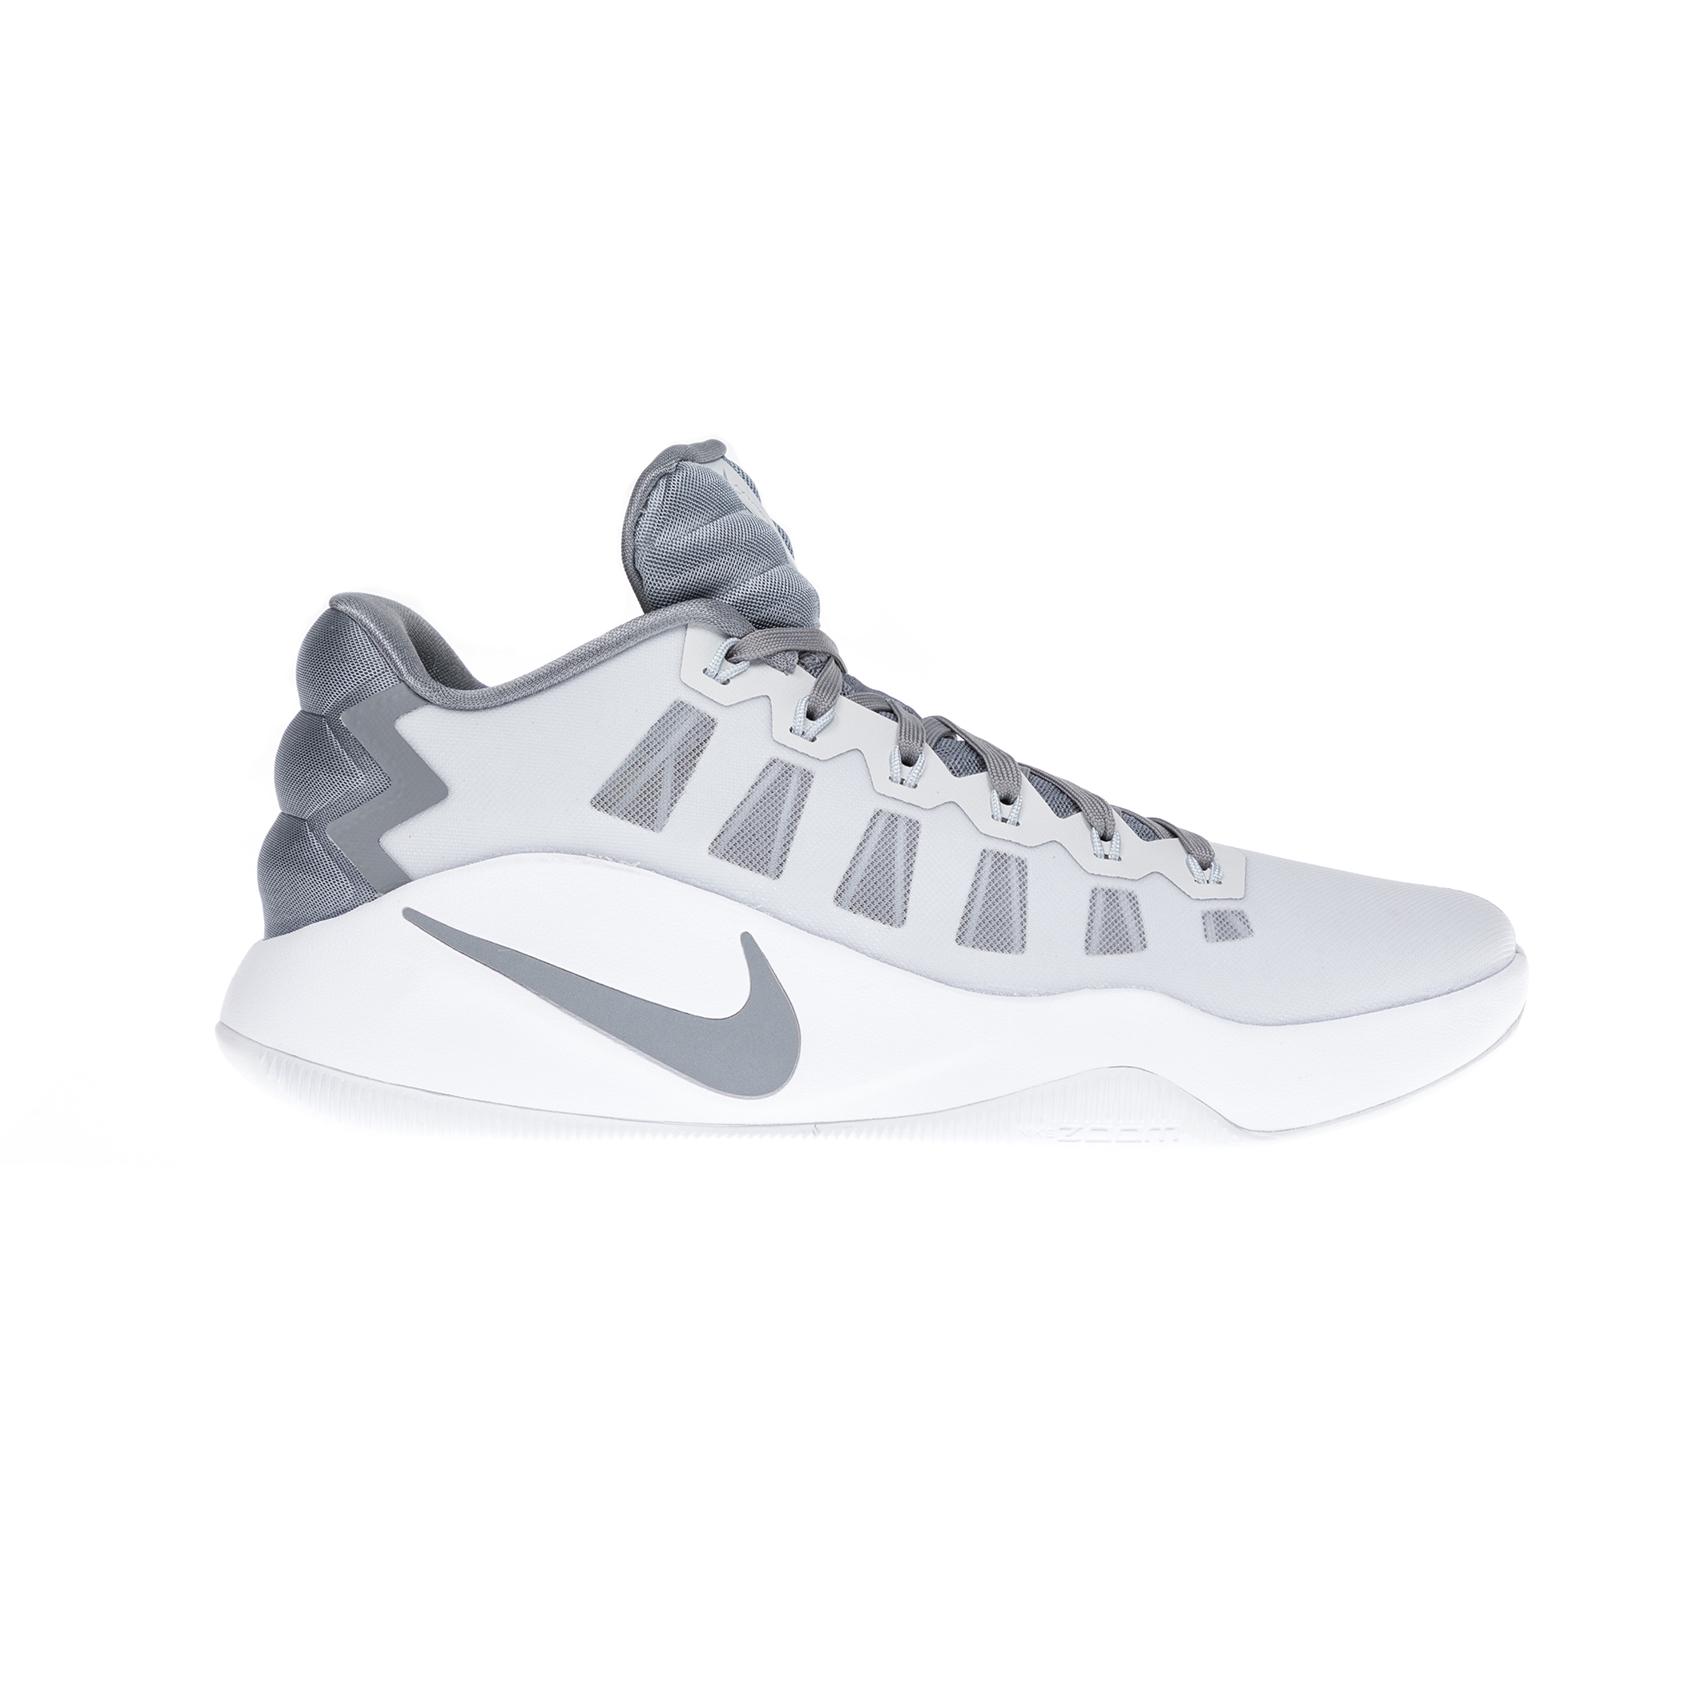 NIKE – Αντρικά παπούτσια NIKE HYPERDUNK 2016 LOW άσπρα